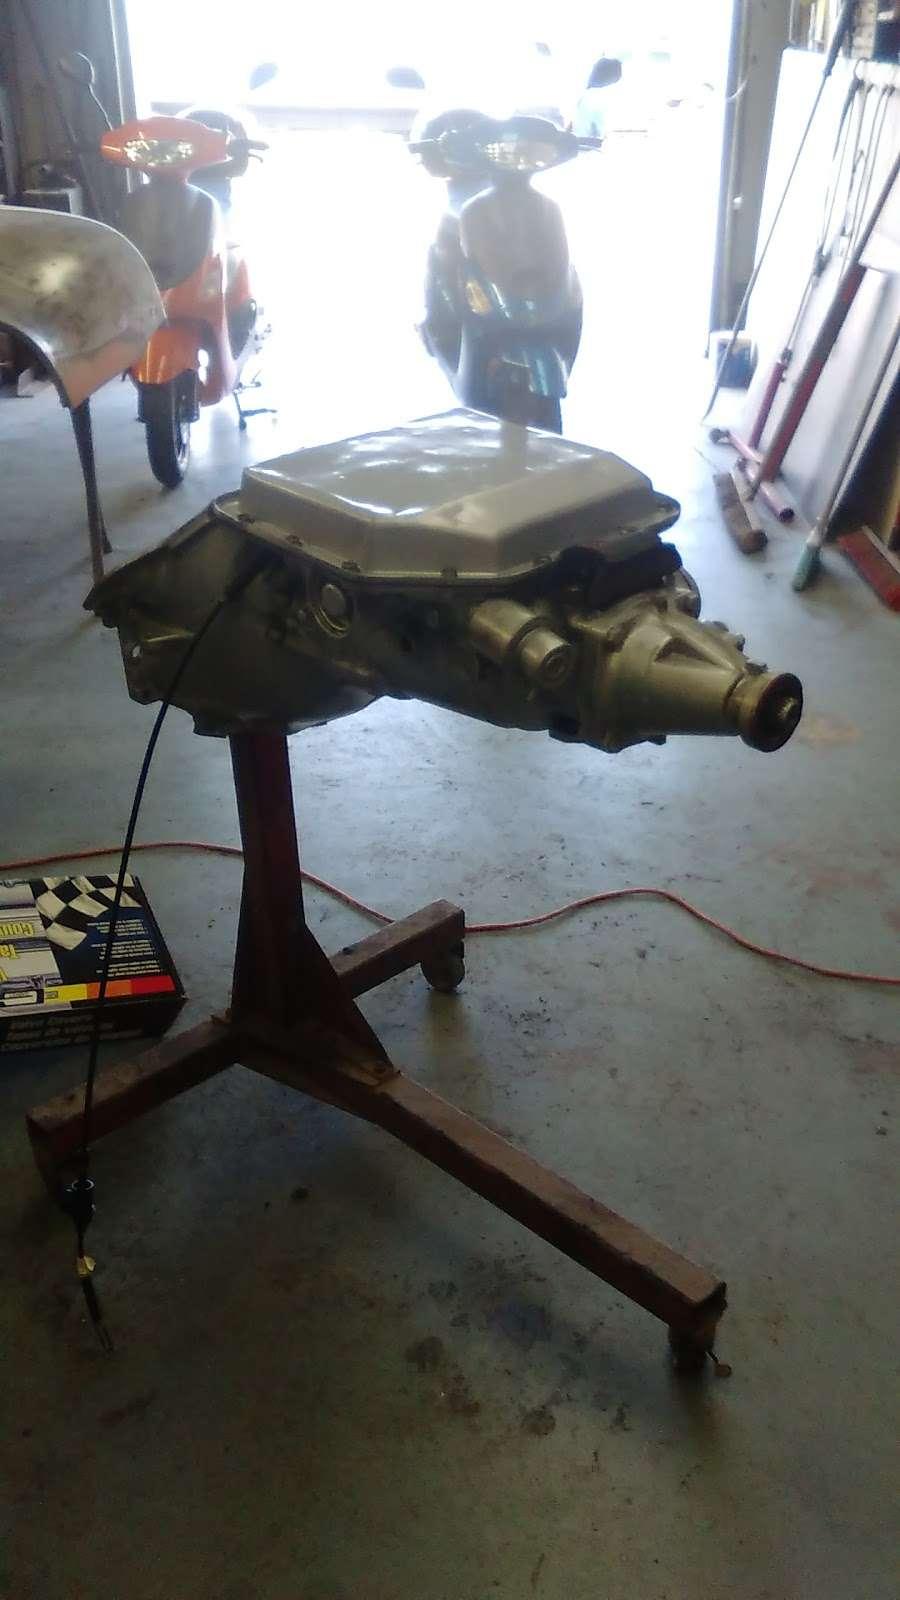 MrCs Automotive Repair And Restoration - car repair  | Photo 10 of 10 | Address: 114 E 12th St, Salisbury, NC 28144, USA | Phone: (336) 554-5501